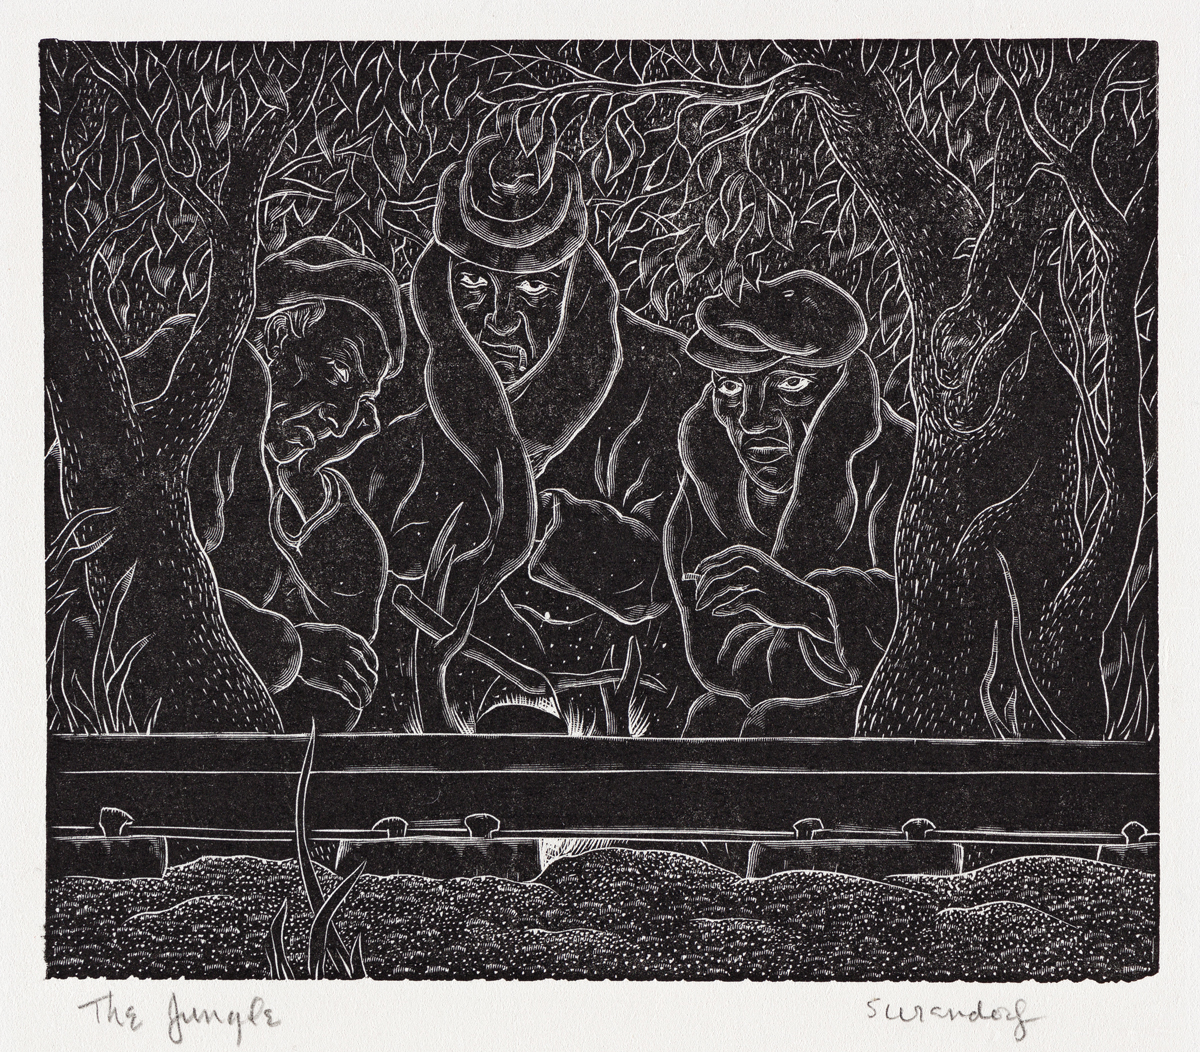 CHARLES SURENDORF (1906-1979) The Jungle.